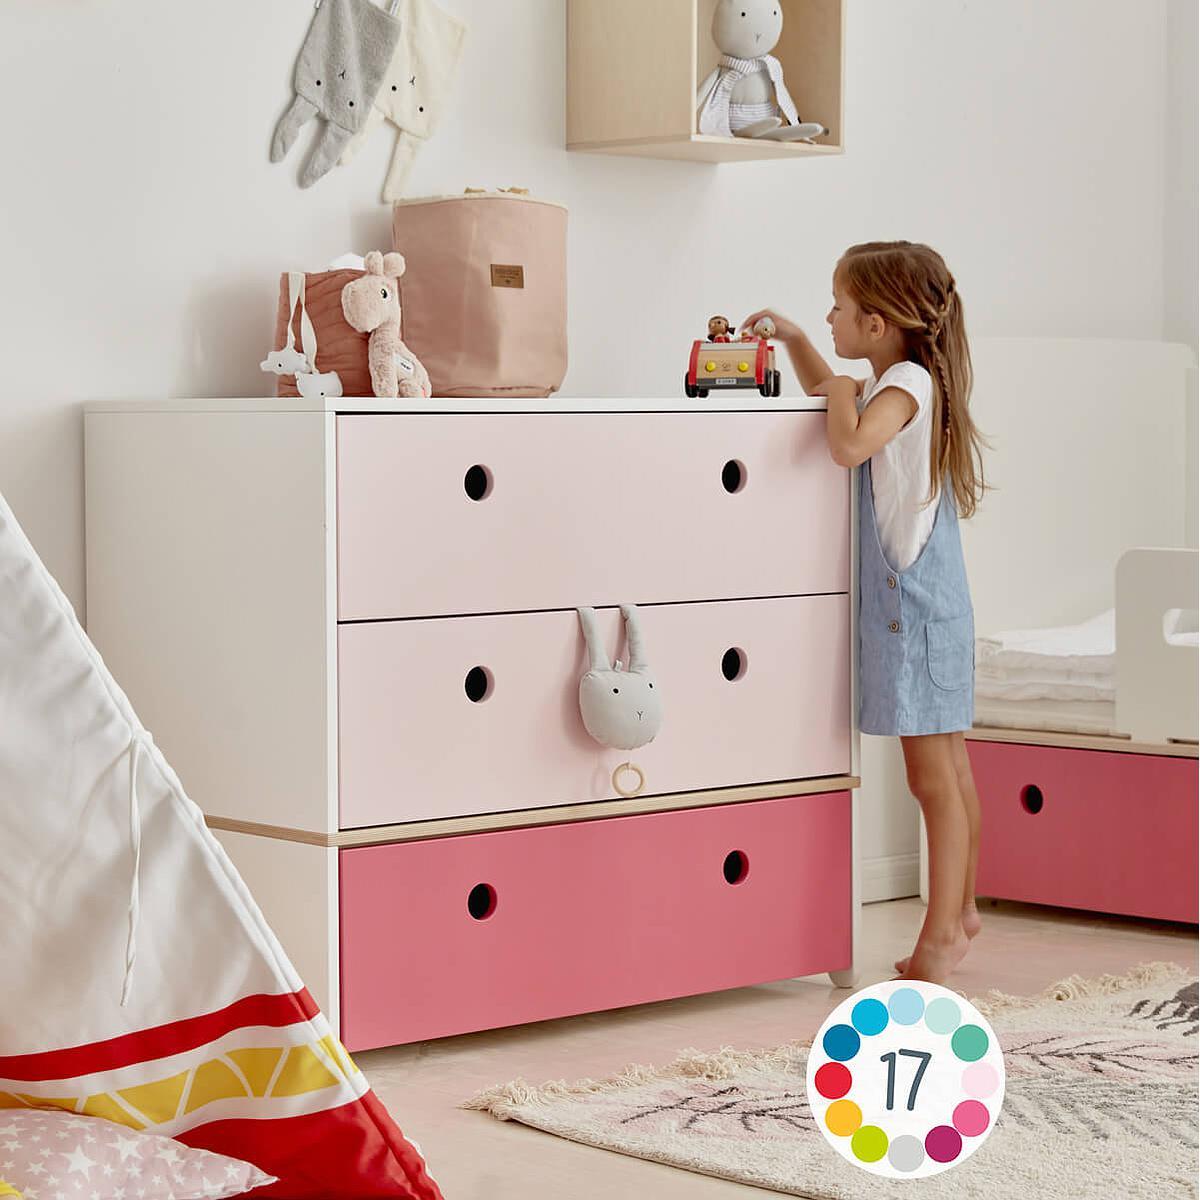 Kommode COLORFLEX Schubladen Farben sweet pink-sweet pink-pearl grey